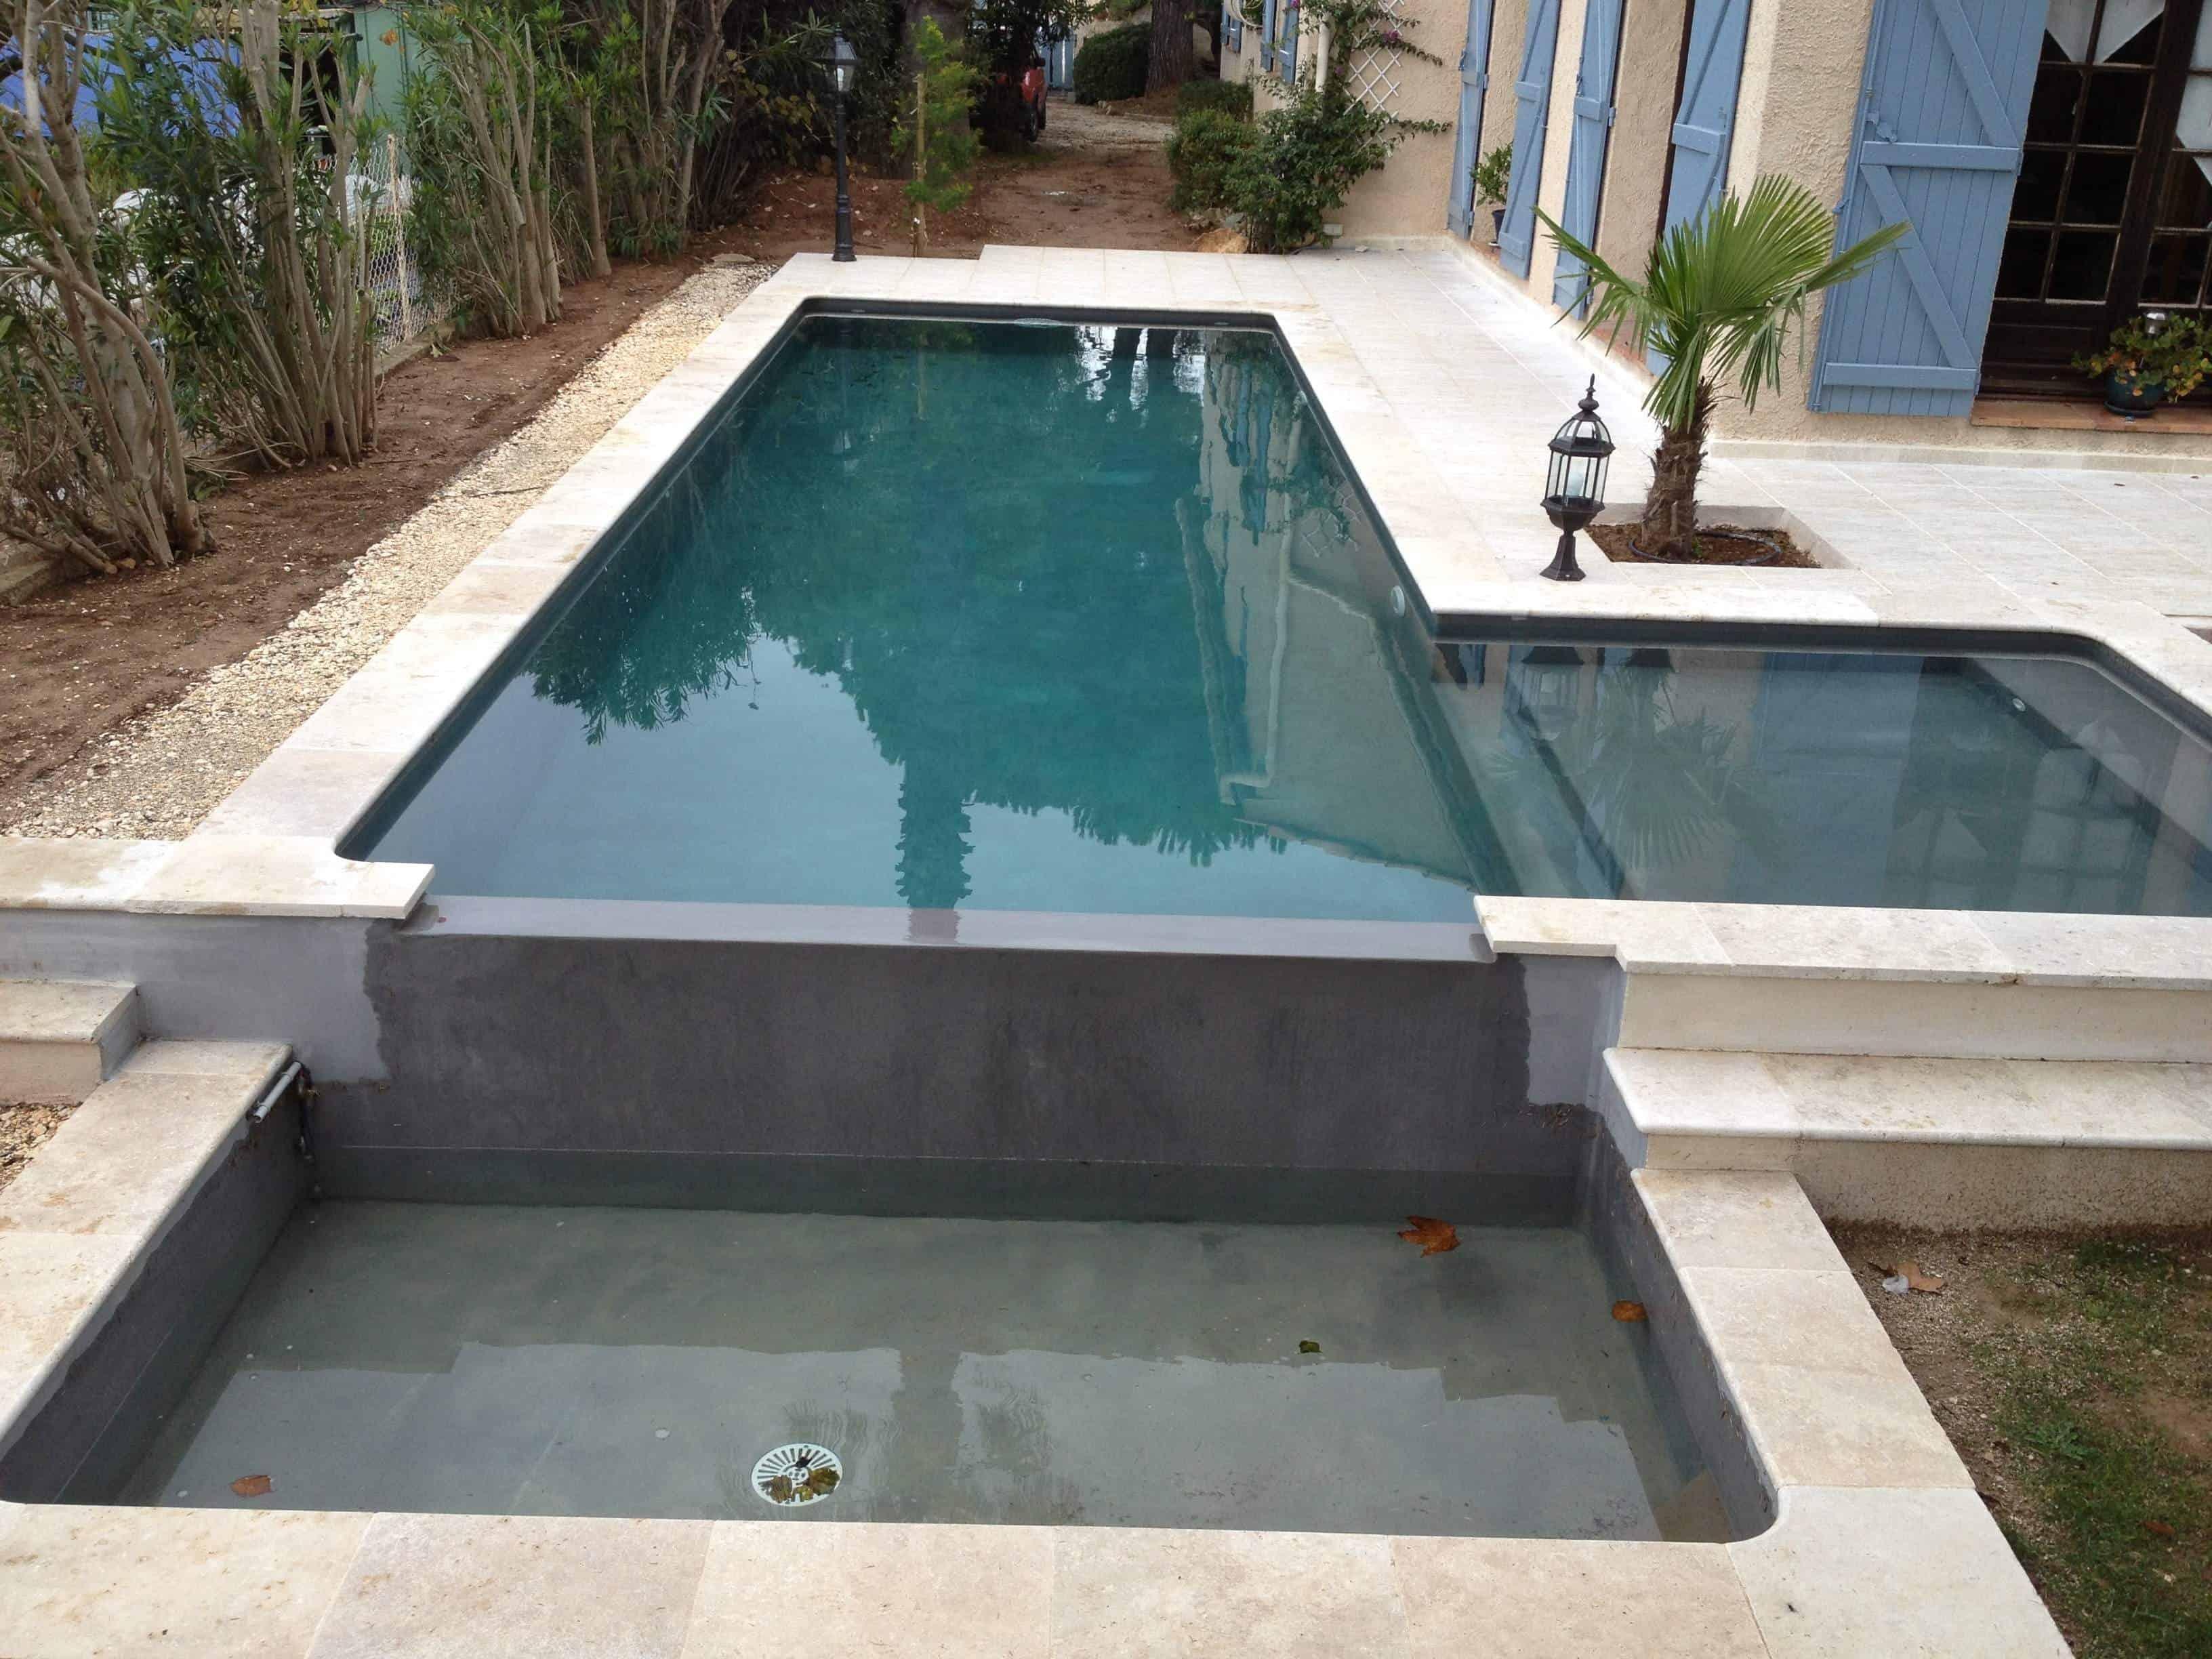 comment bien choisir sa future piscine coque nos. Black Bedroom Furniture Sets. Home Design Ideas